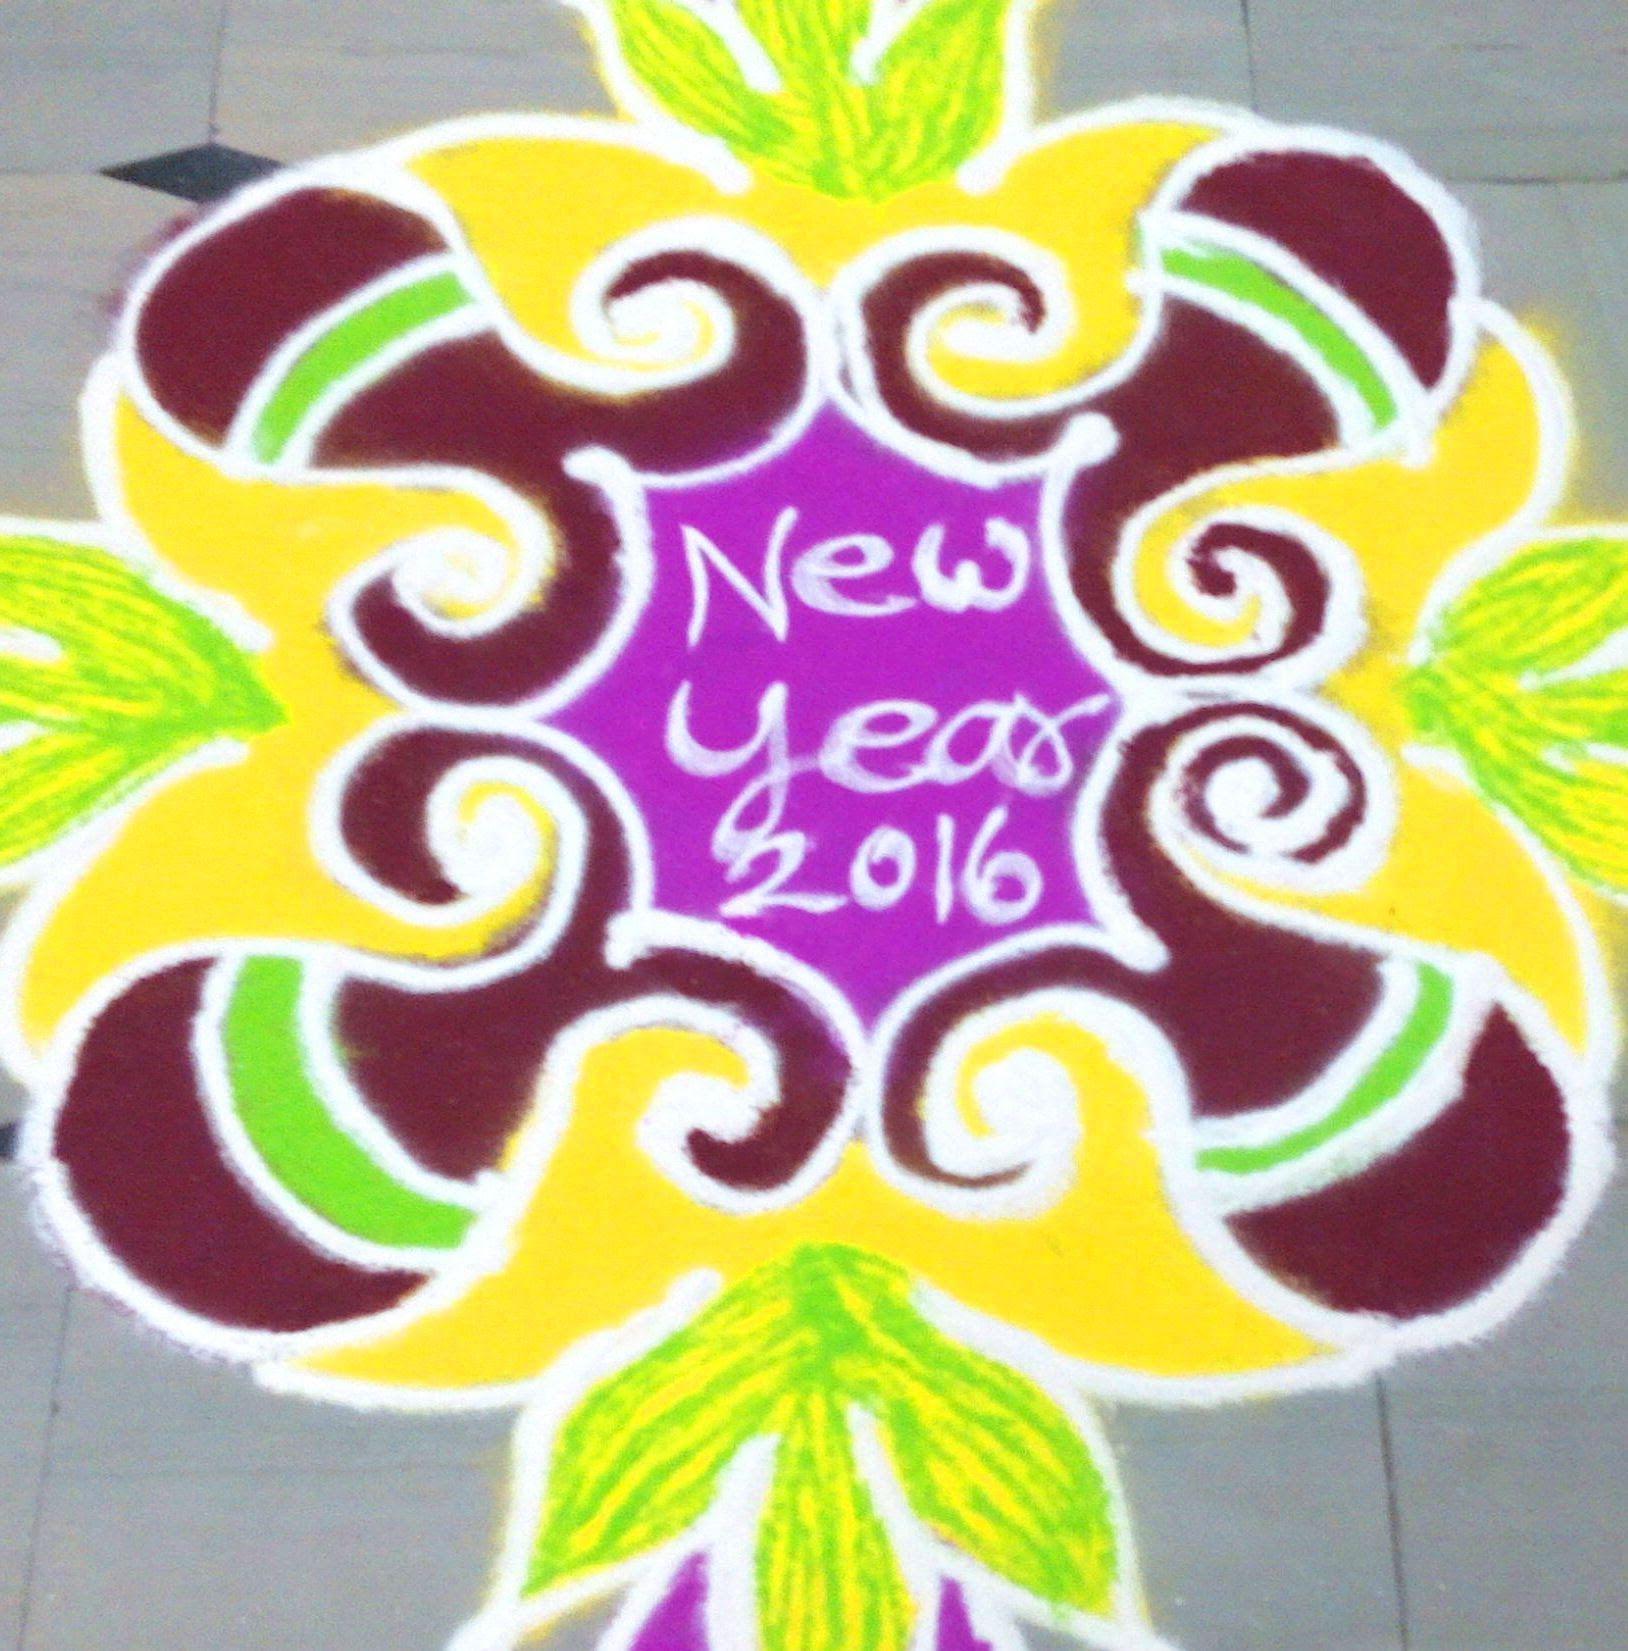 Rangoli for New Year 2016 - Colorful designs   Vasu Rangoli ... for Latest Rangoli Designs With Dots For New Year 2015  557yll